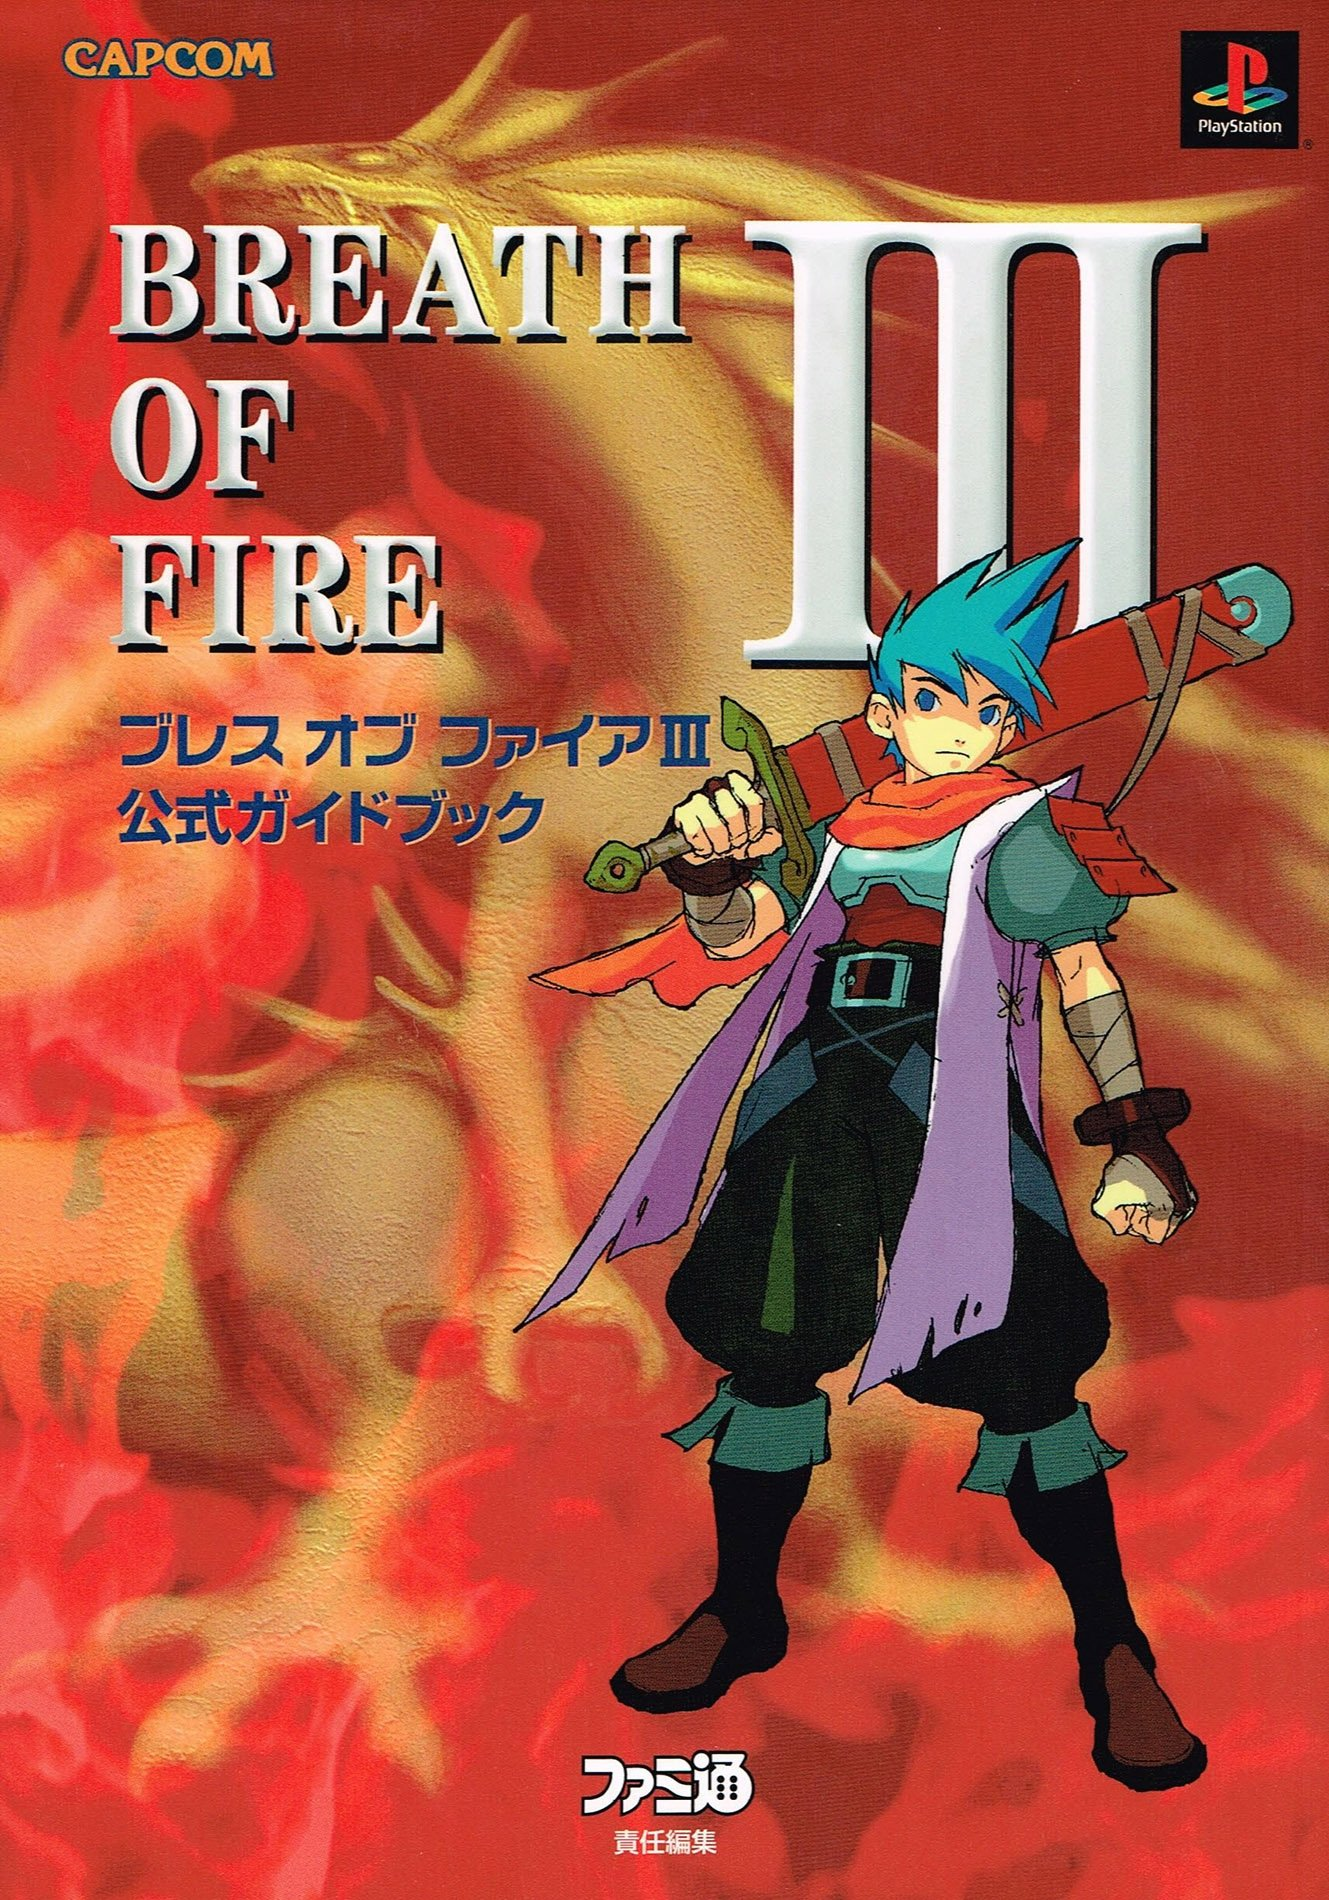 Breath of Fire III: Complete Guidebook